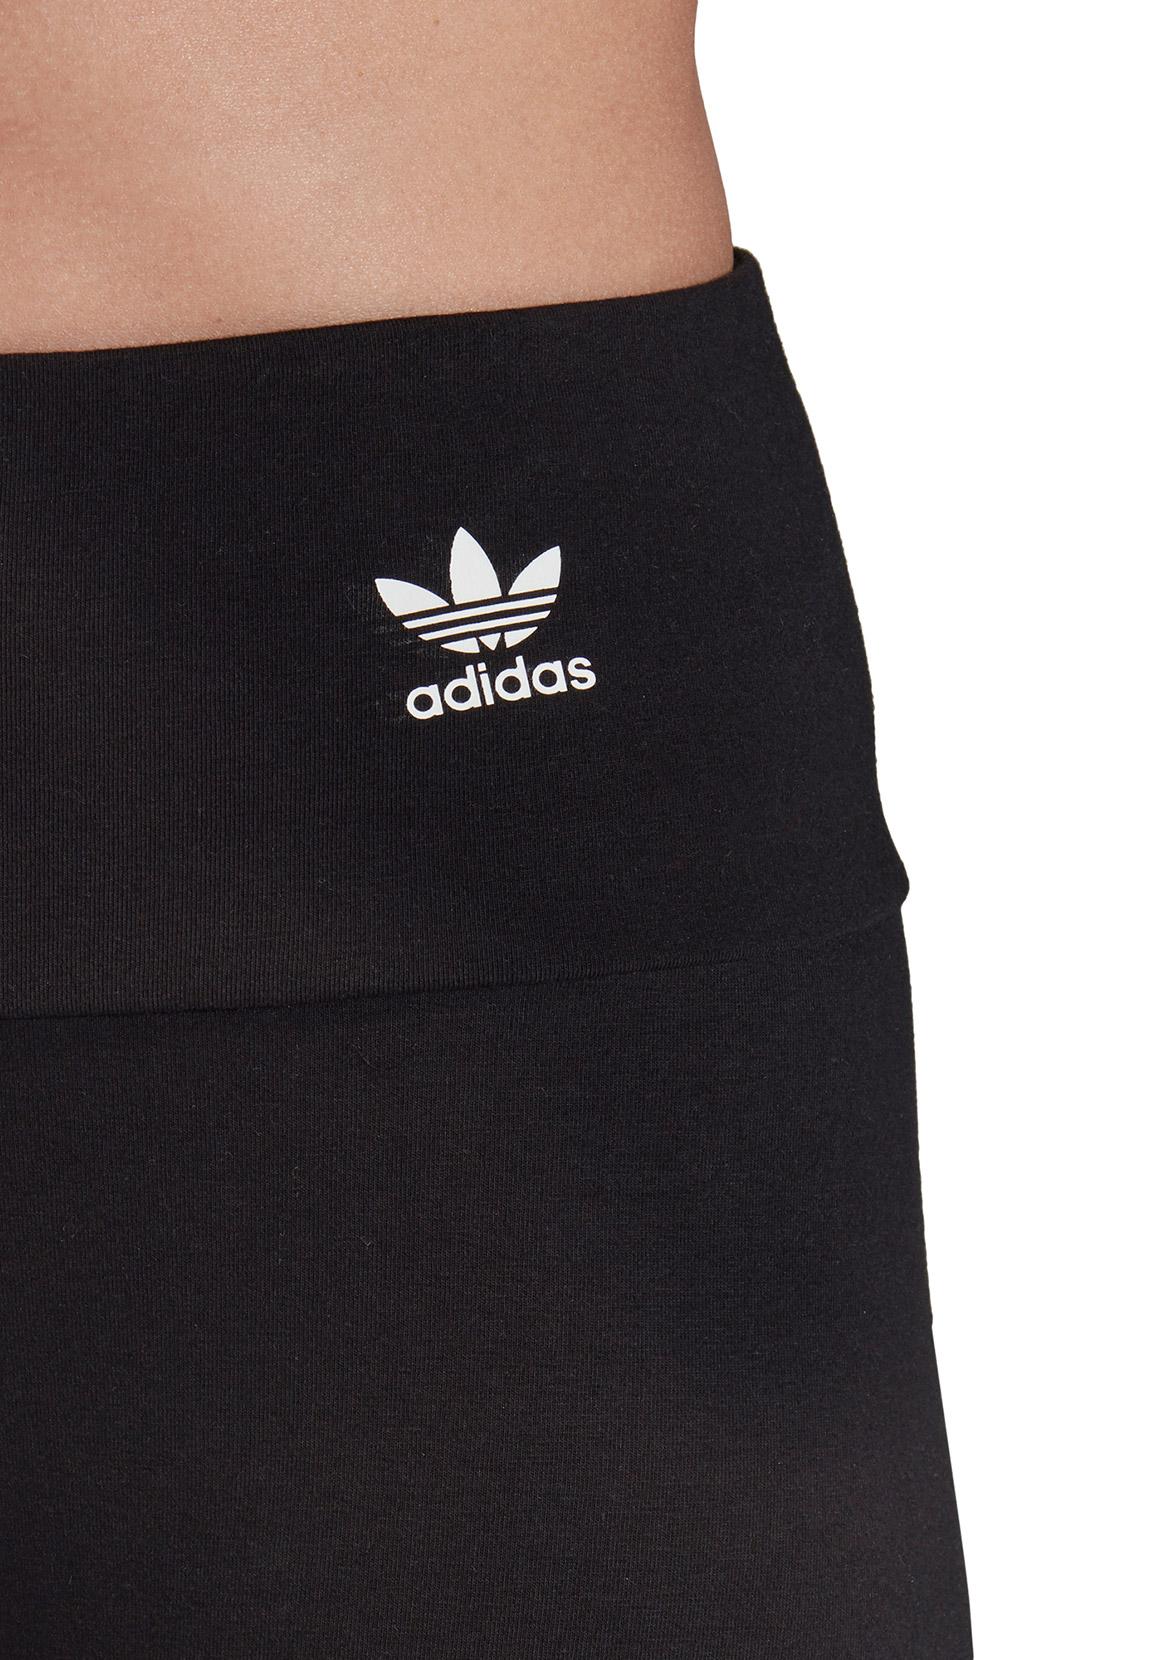 Adidas Originals Leggings Damen LGR LOGO TIGHT FQ6822